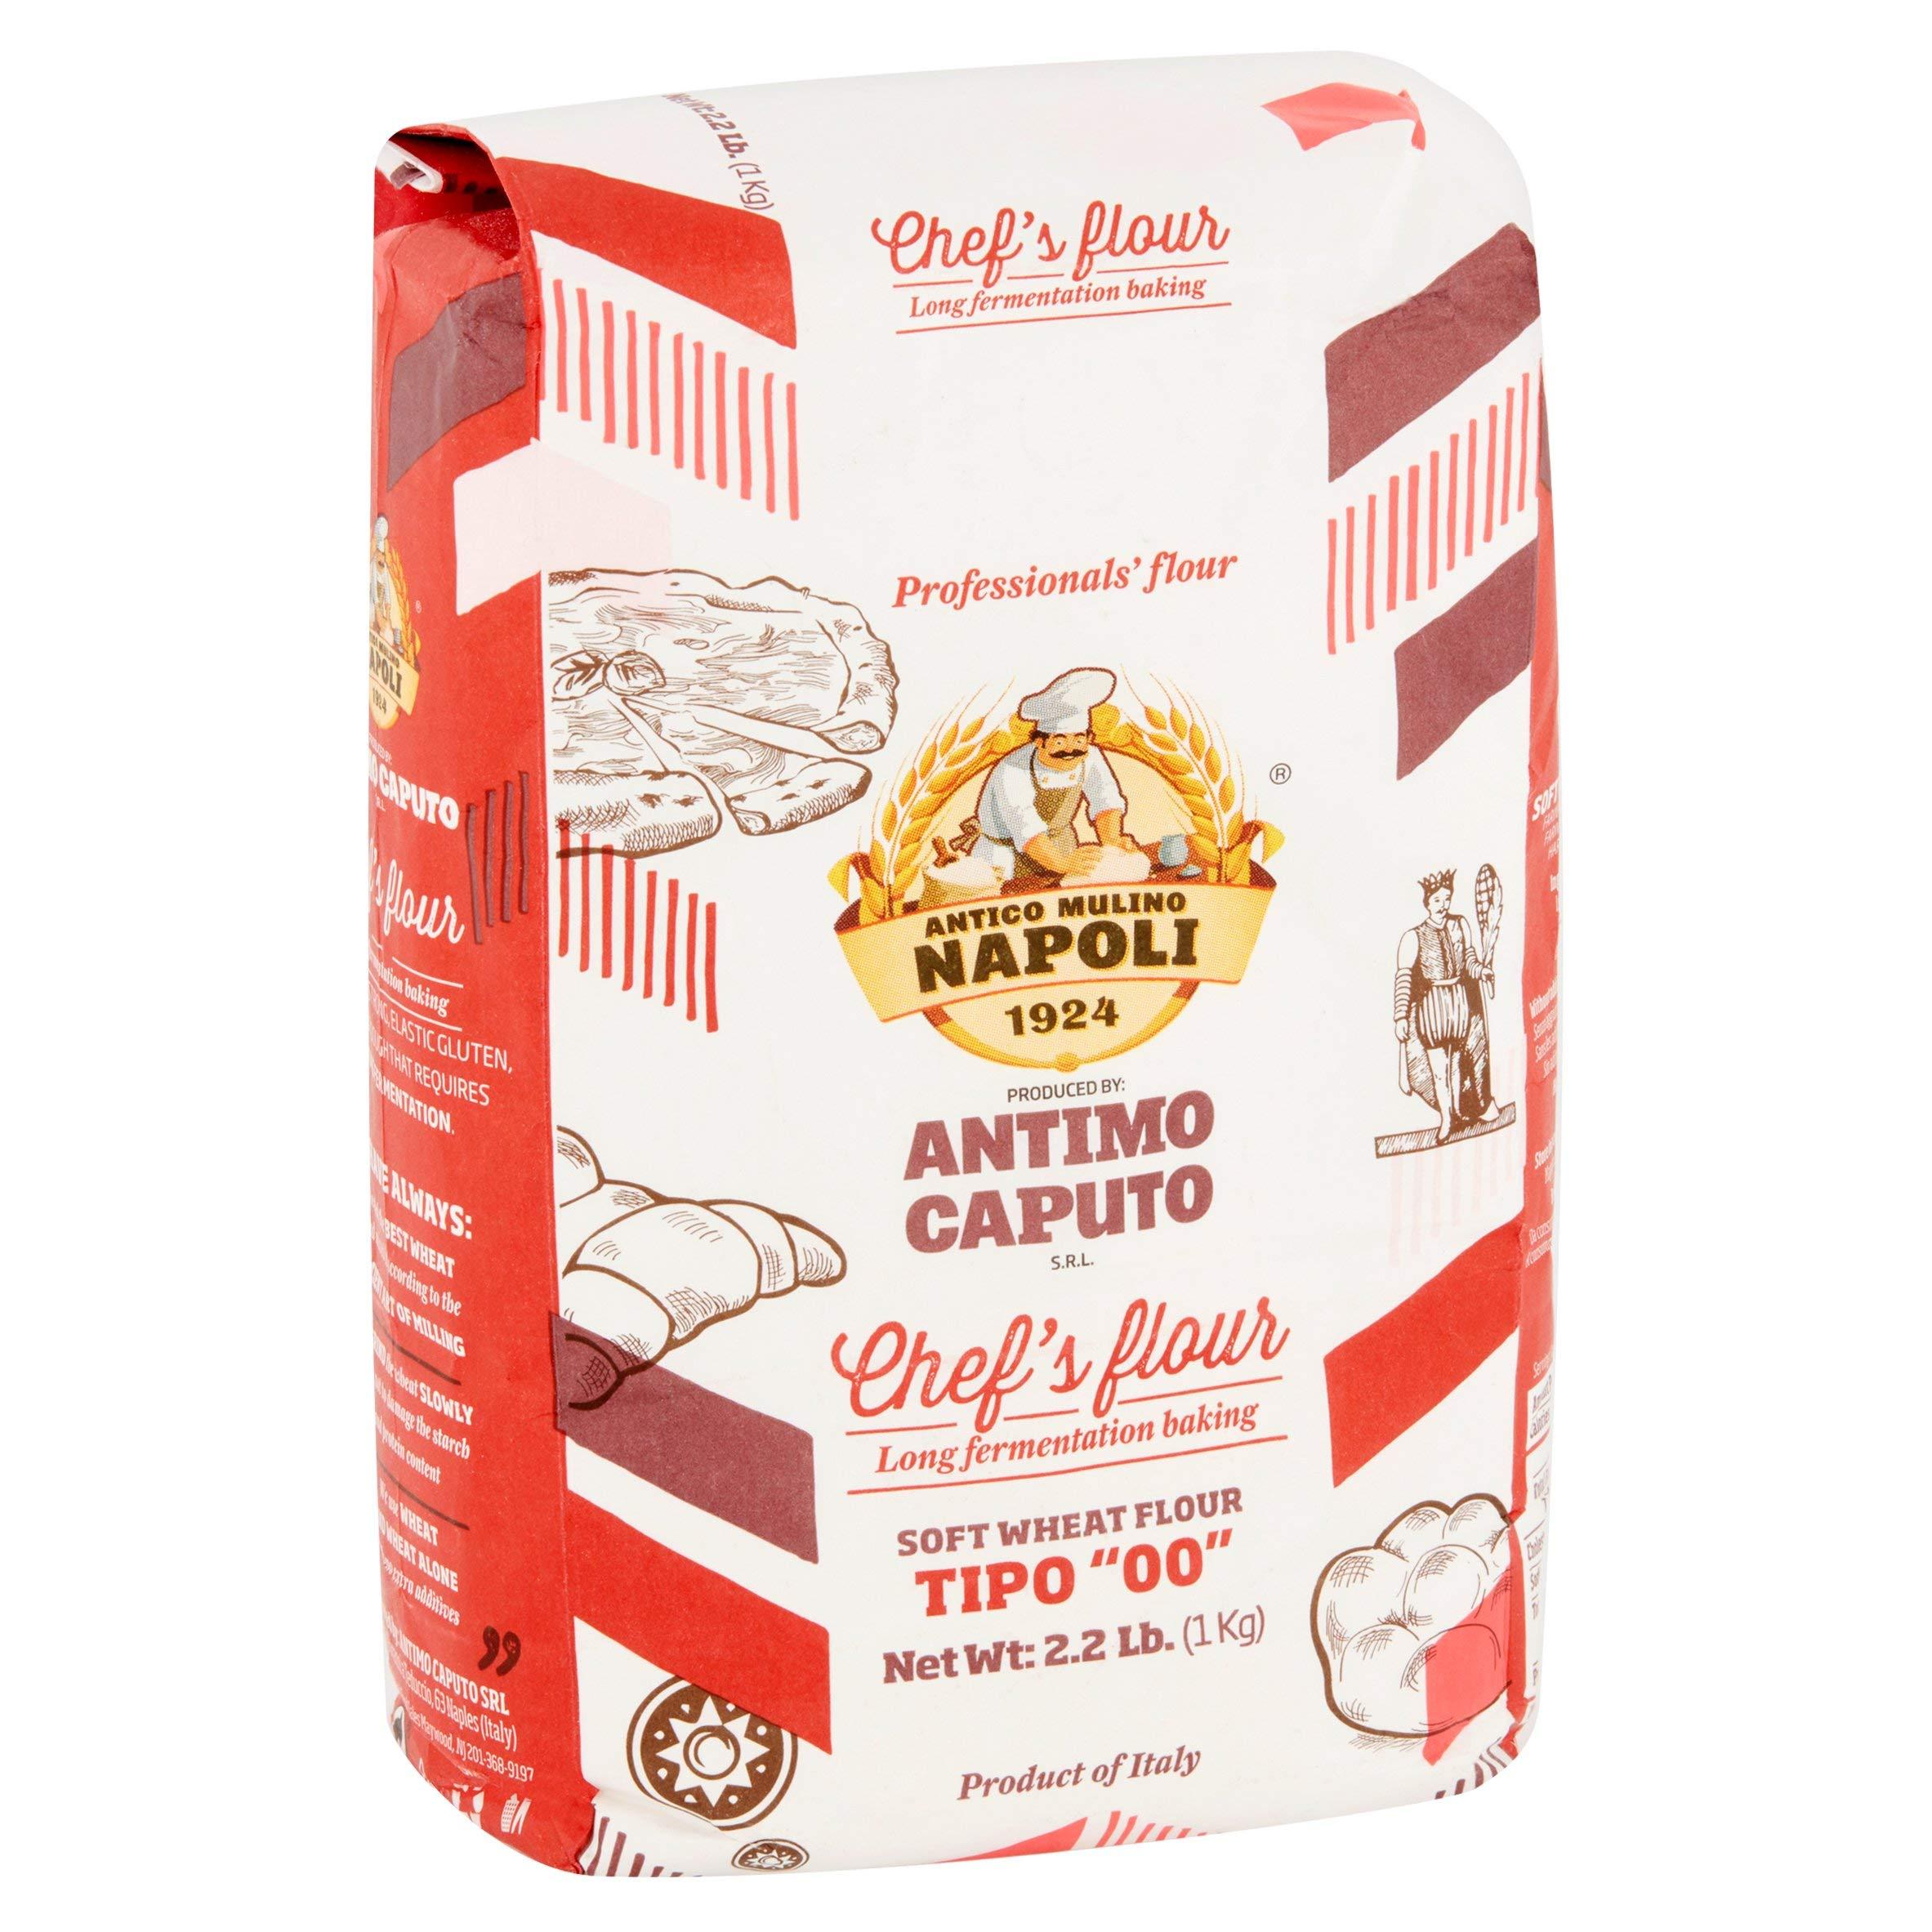 Antimo Caputo Chefs Flour 2.2 LB (Case of 10) - Italian Double Zero 00 - Soft Wheat for Pizza Dough, Bread, & Pasta by Antimo Caputo